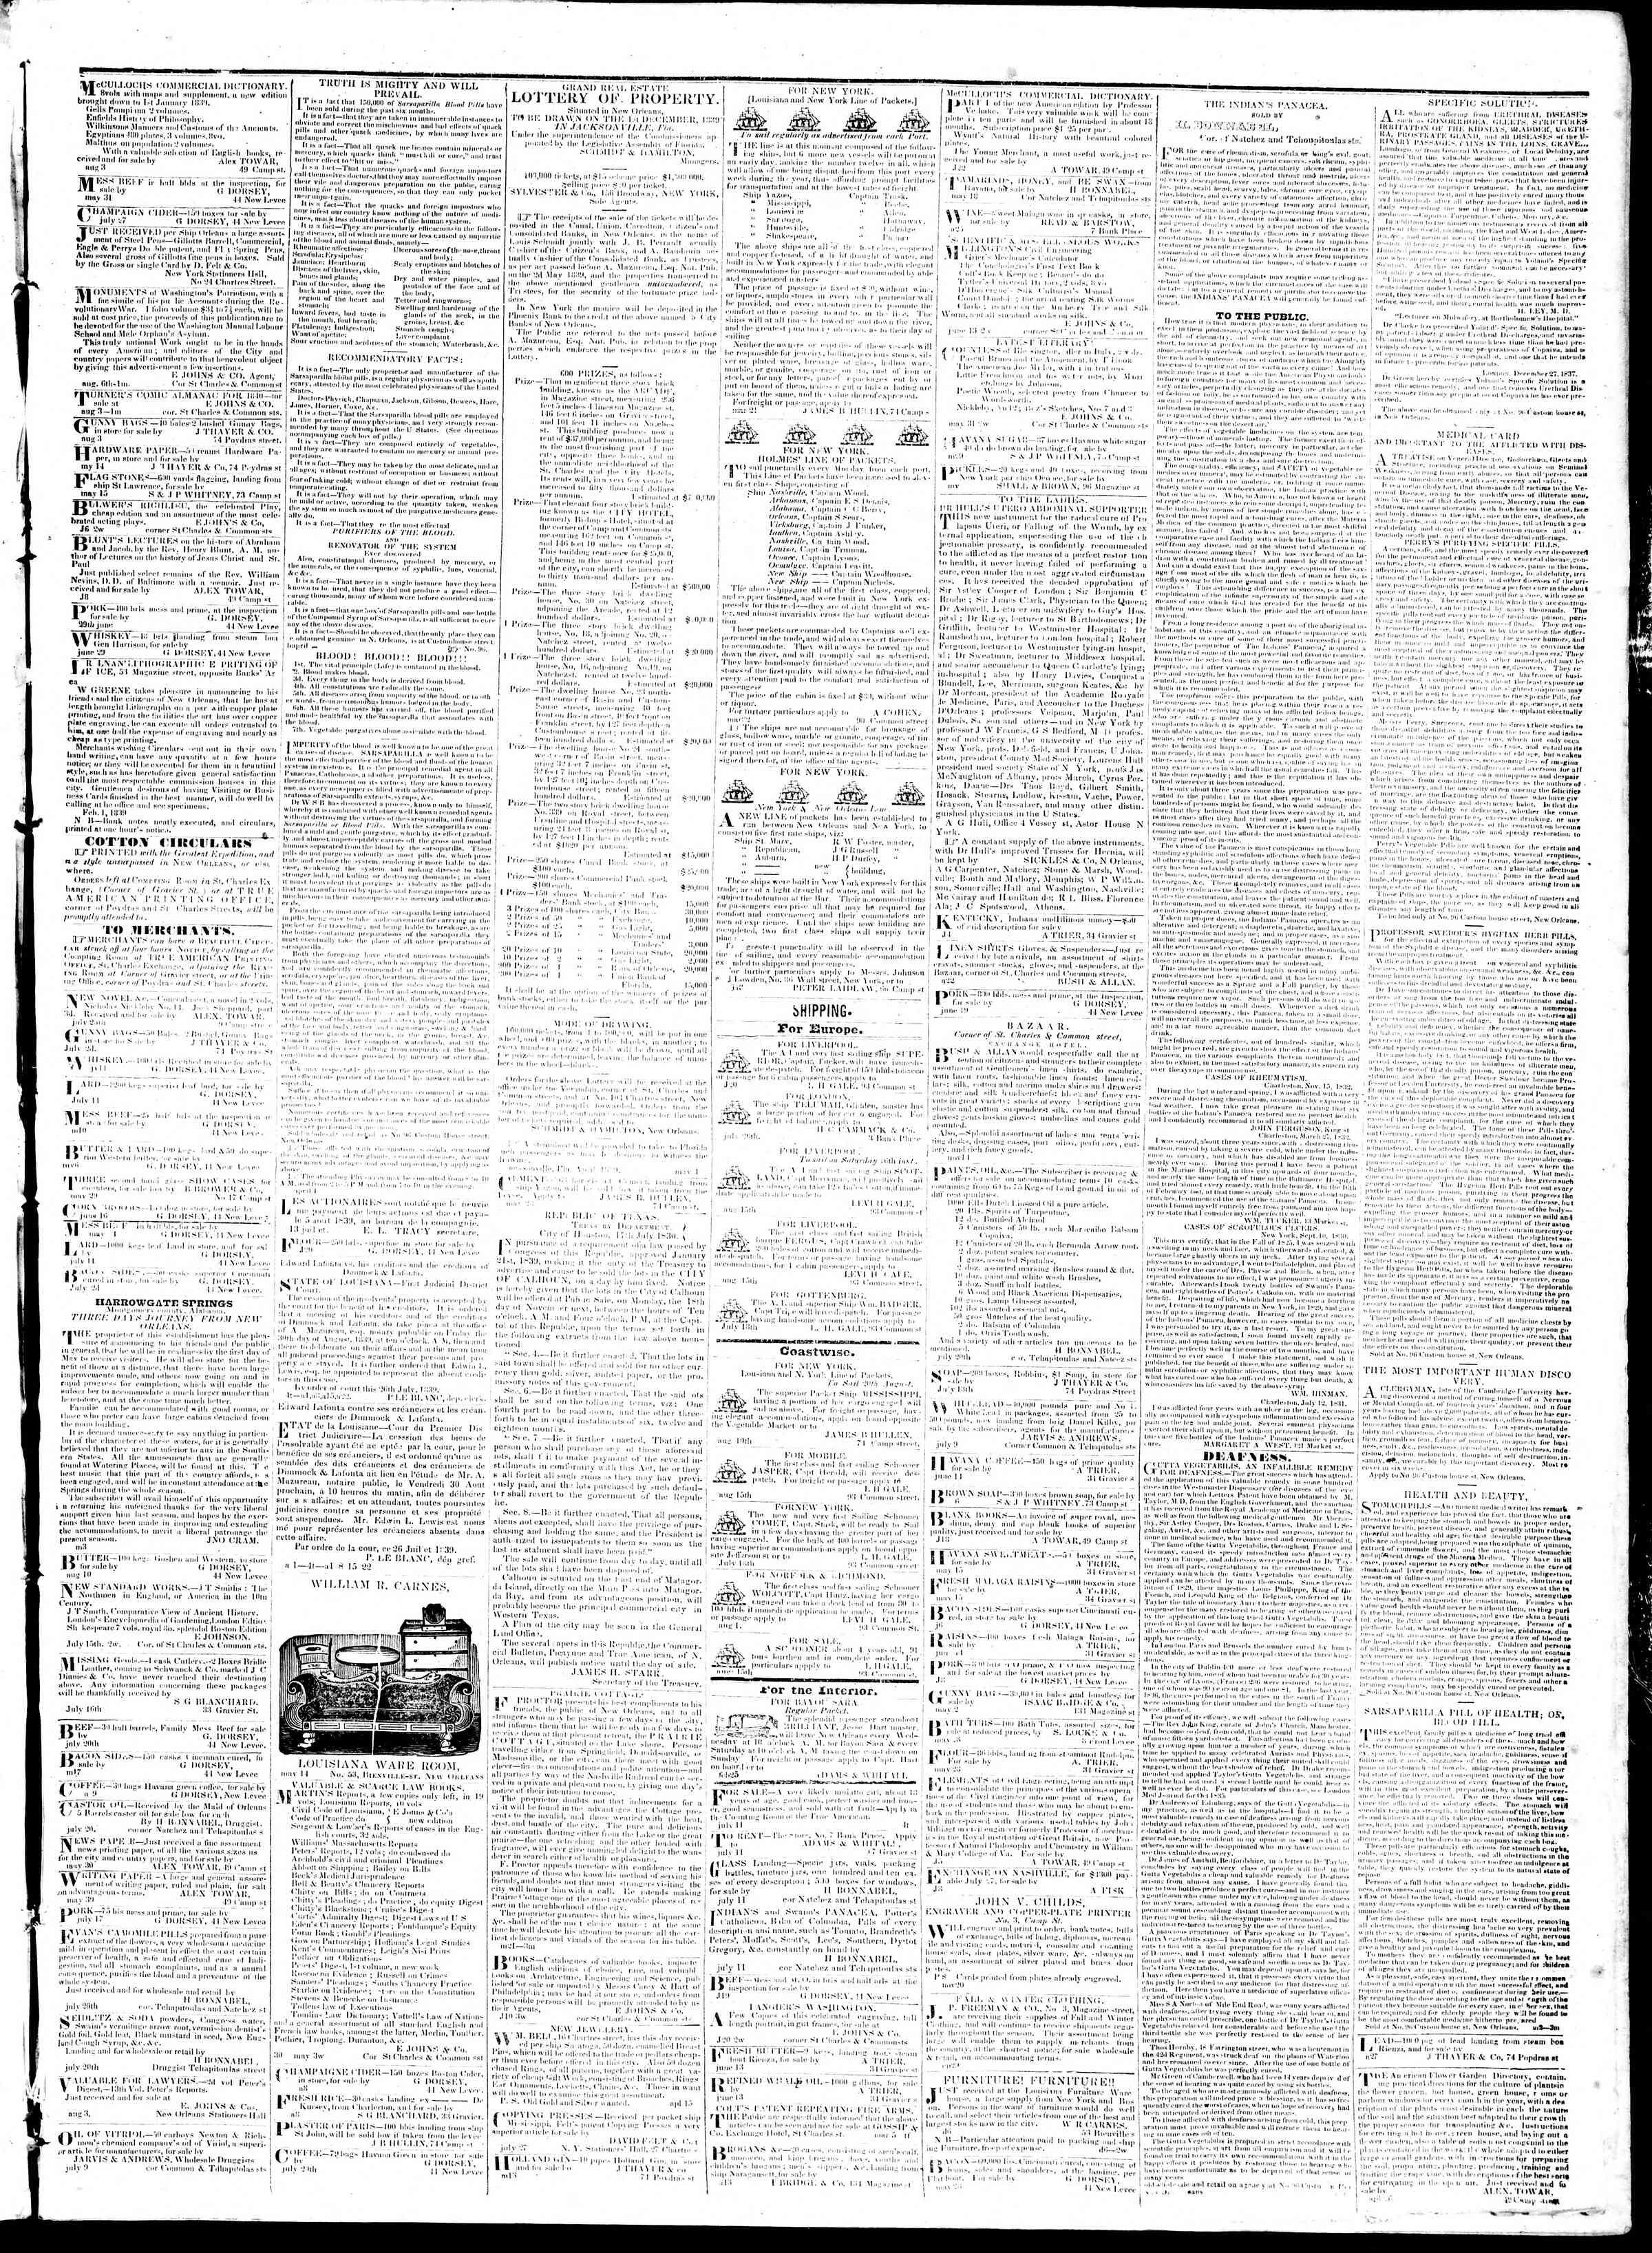 August 20, 1839 Tarihli True American Gazetesi Sayfa 3